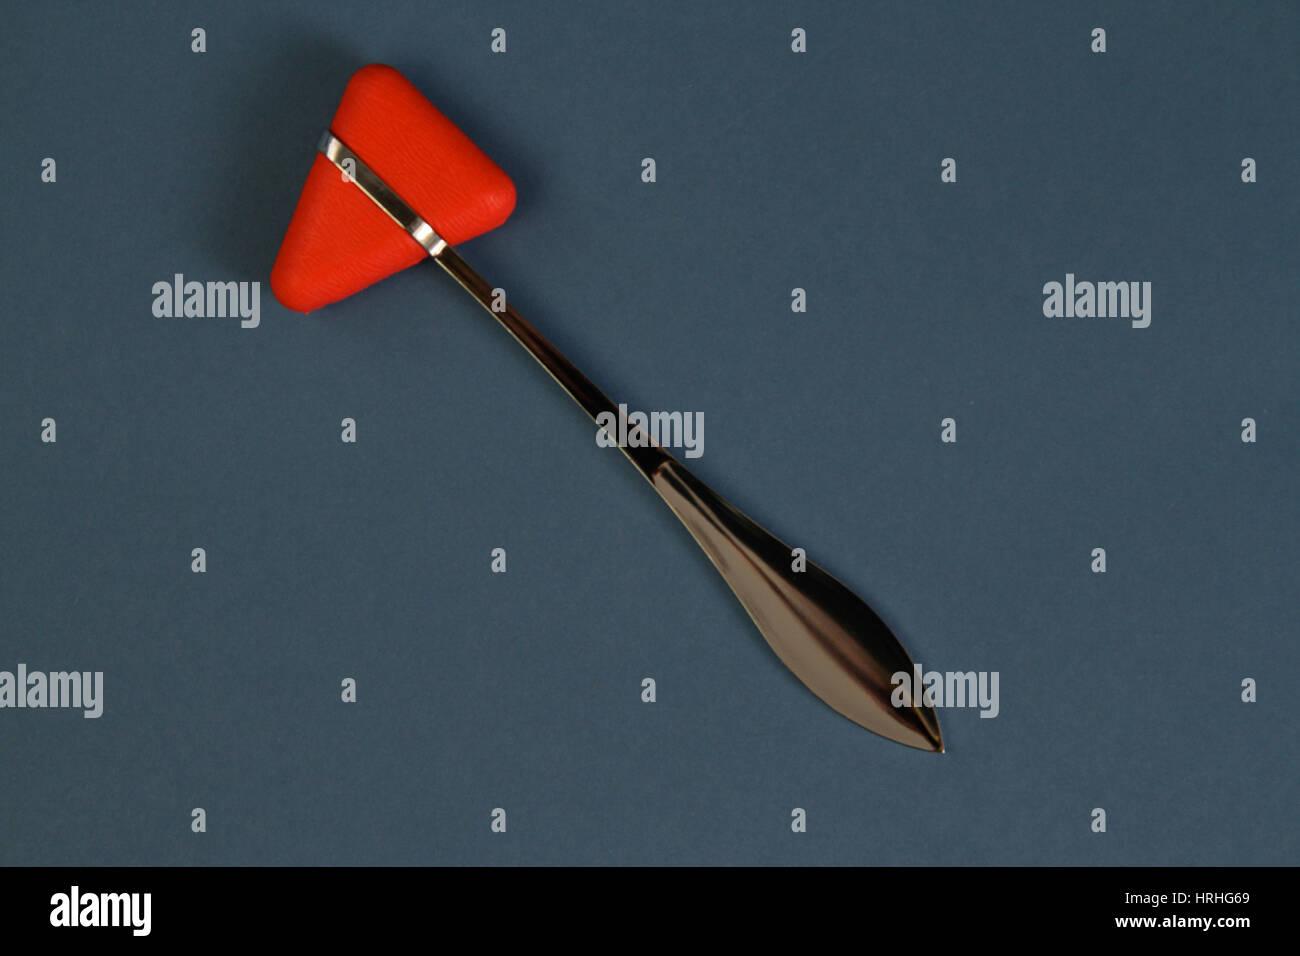 Reflex hammer Stock Photo